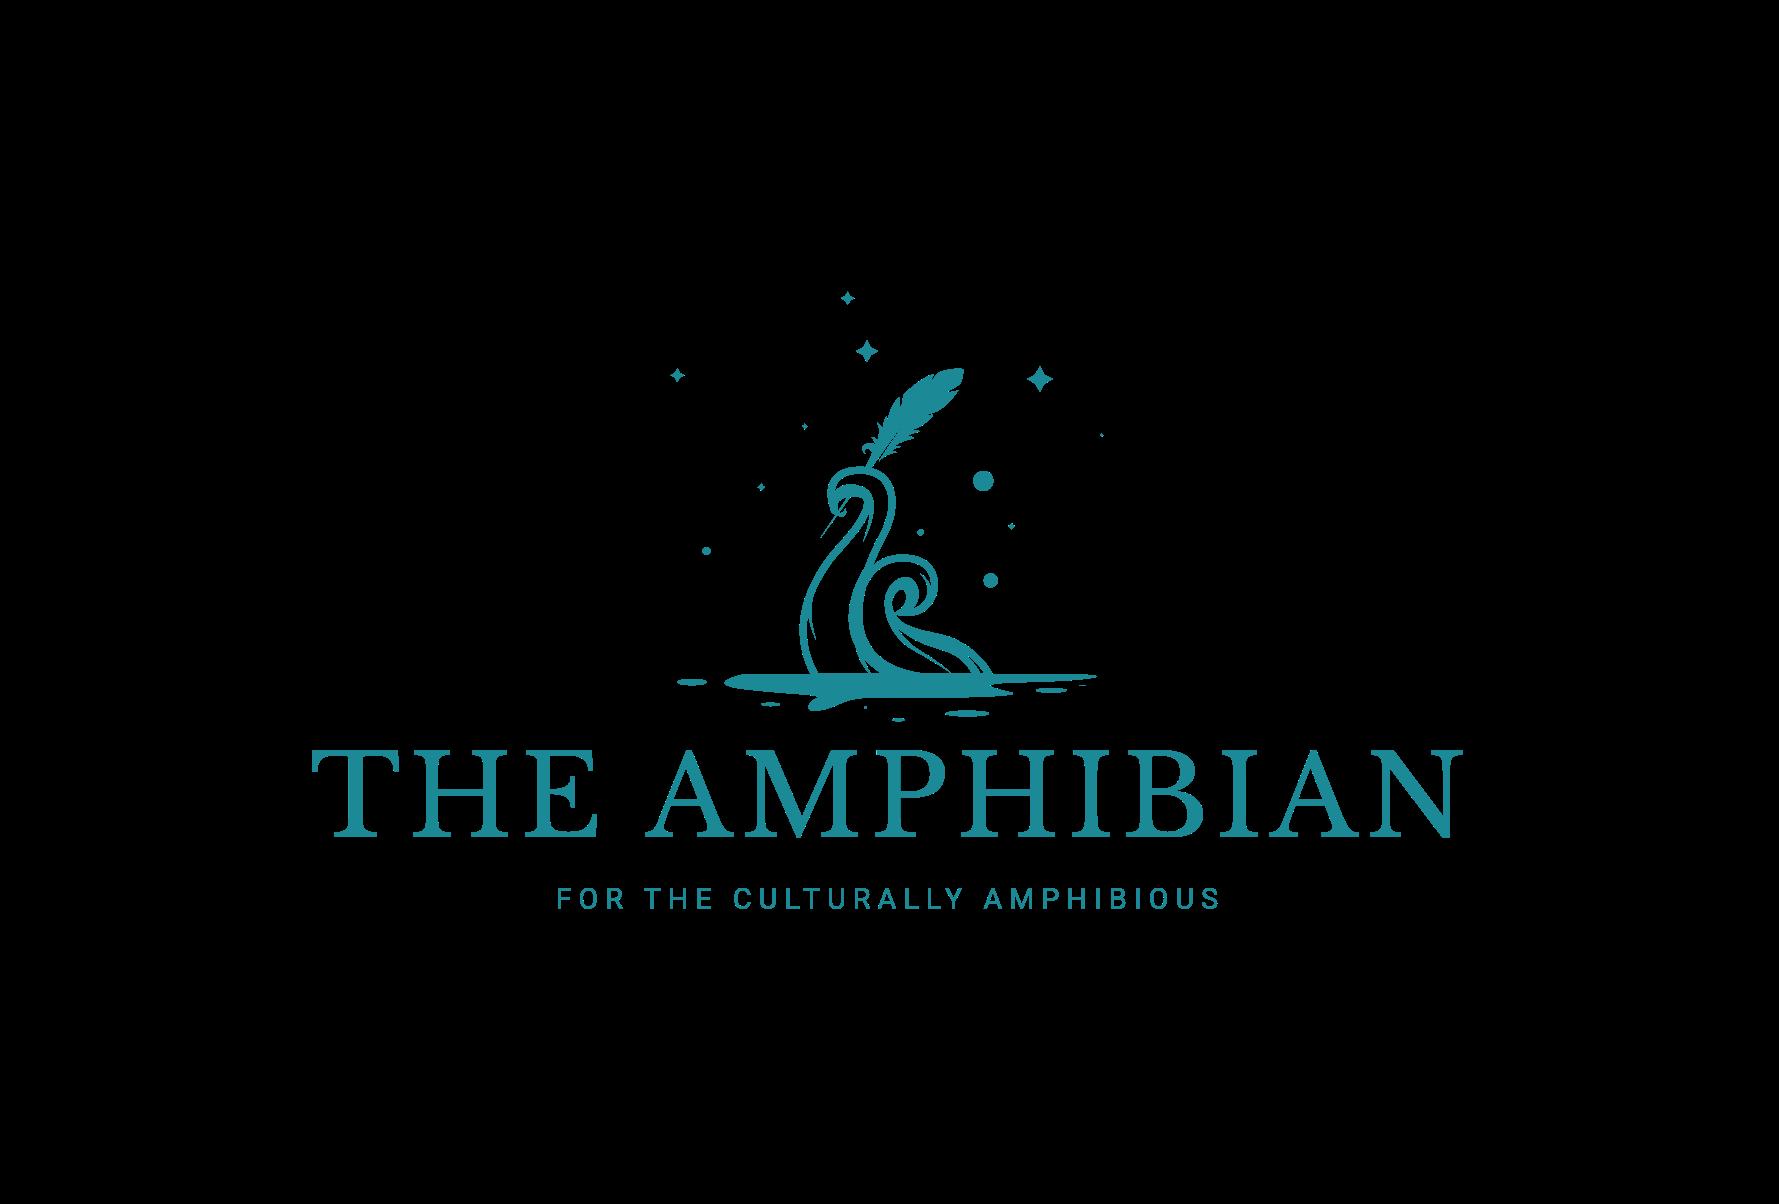 The Amphibian Literary Journal